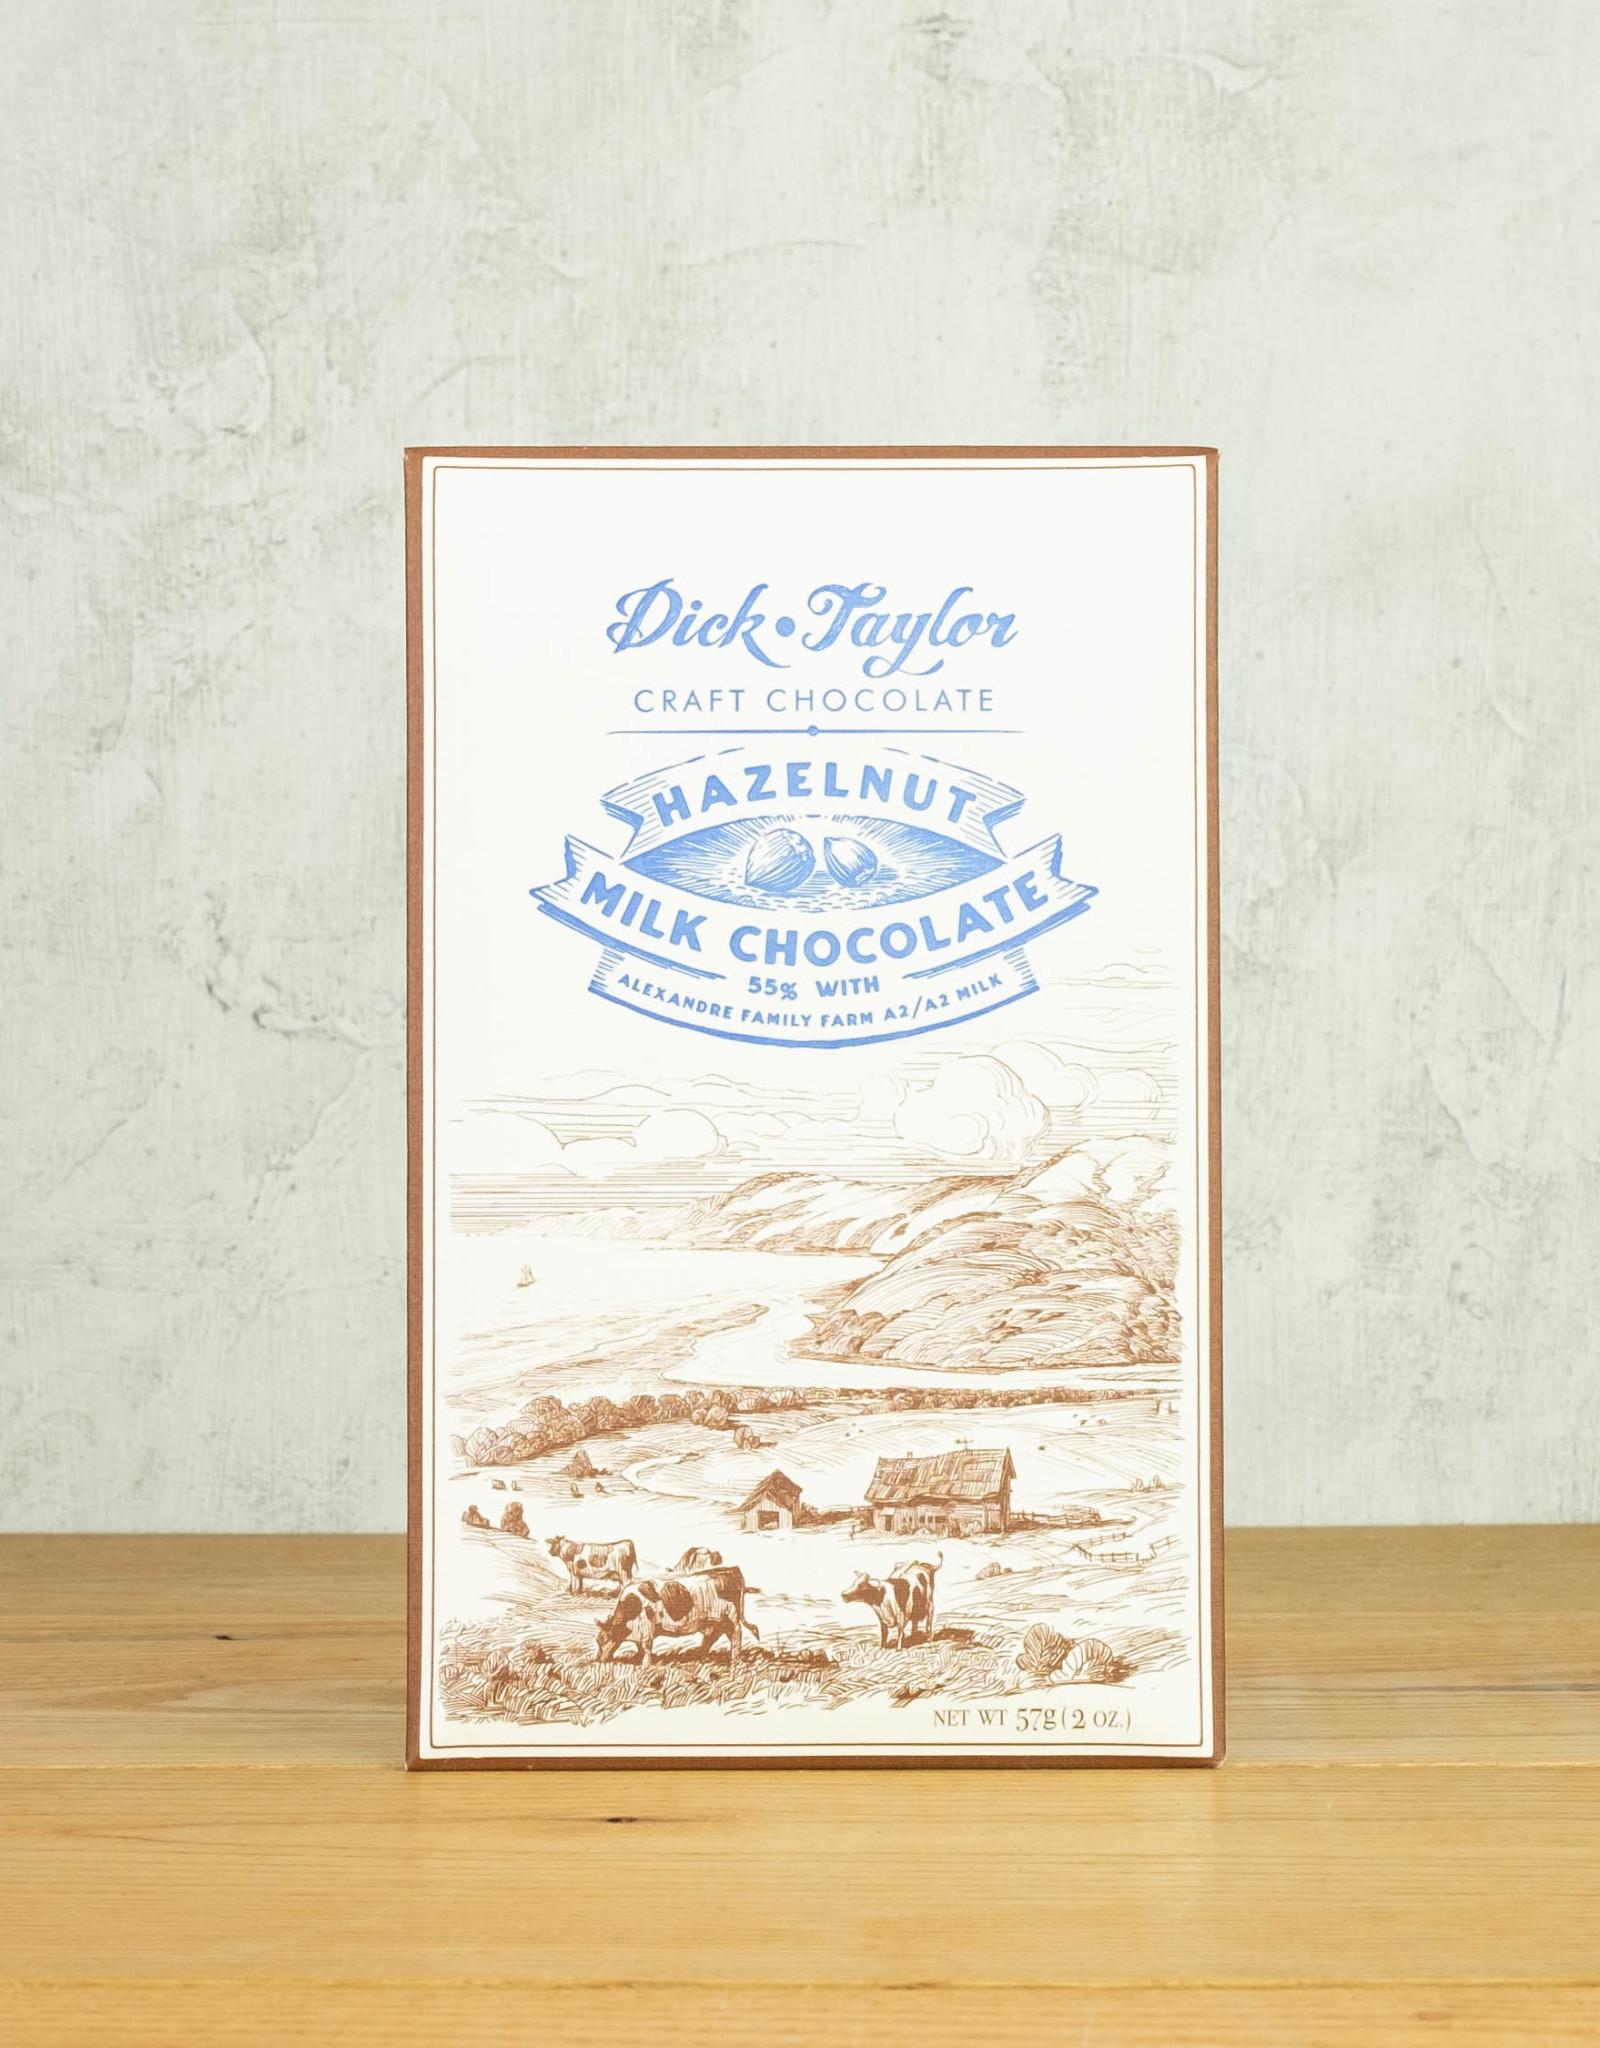 Dick Taylor 55% Hazelnut Milk Chocolate